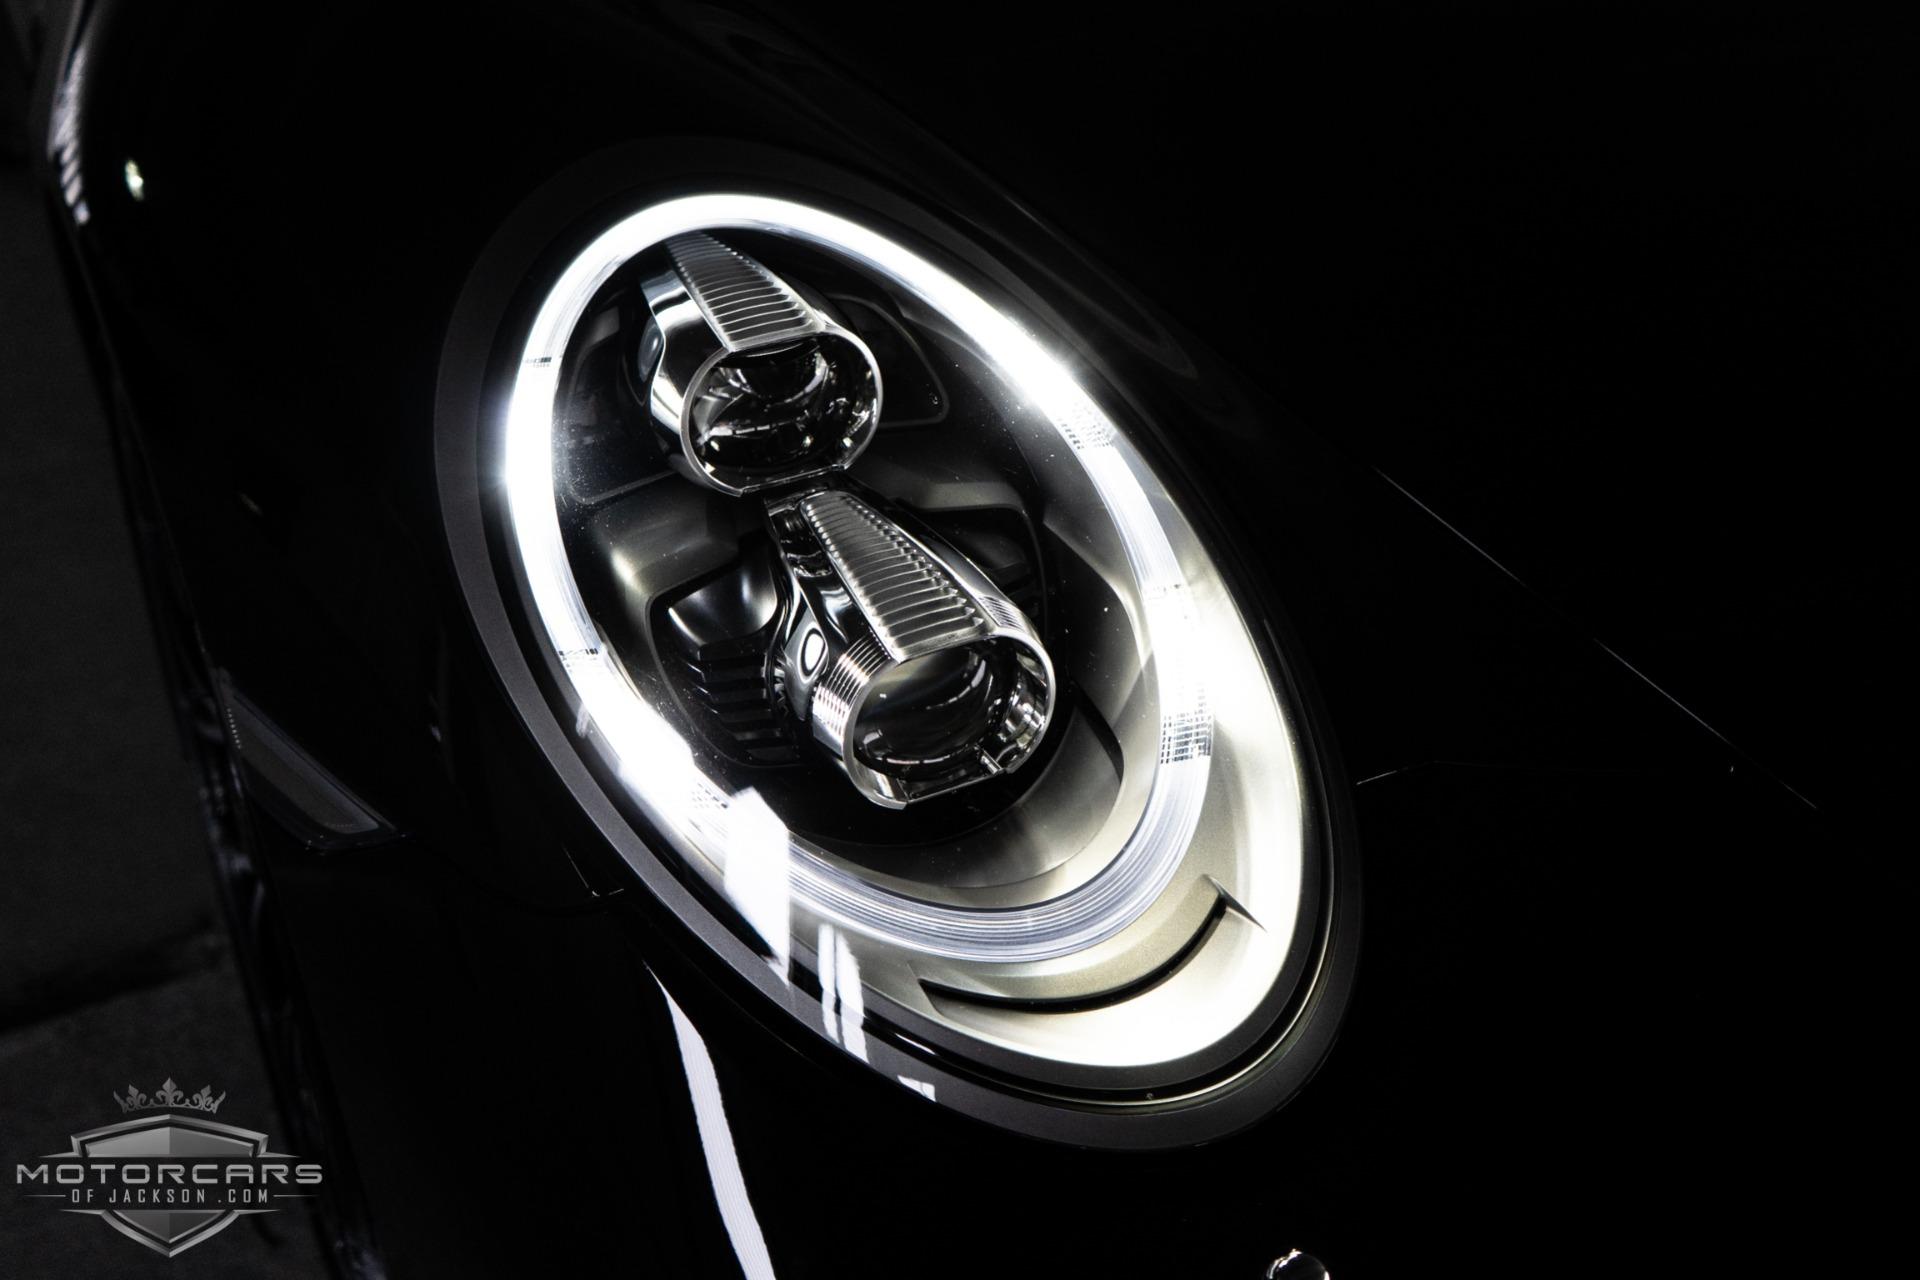 Used-2018-Porsche-911-Turbo-S-Cabriolet-Jackson-MS